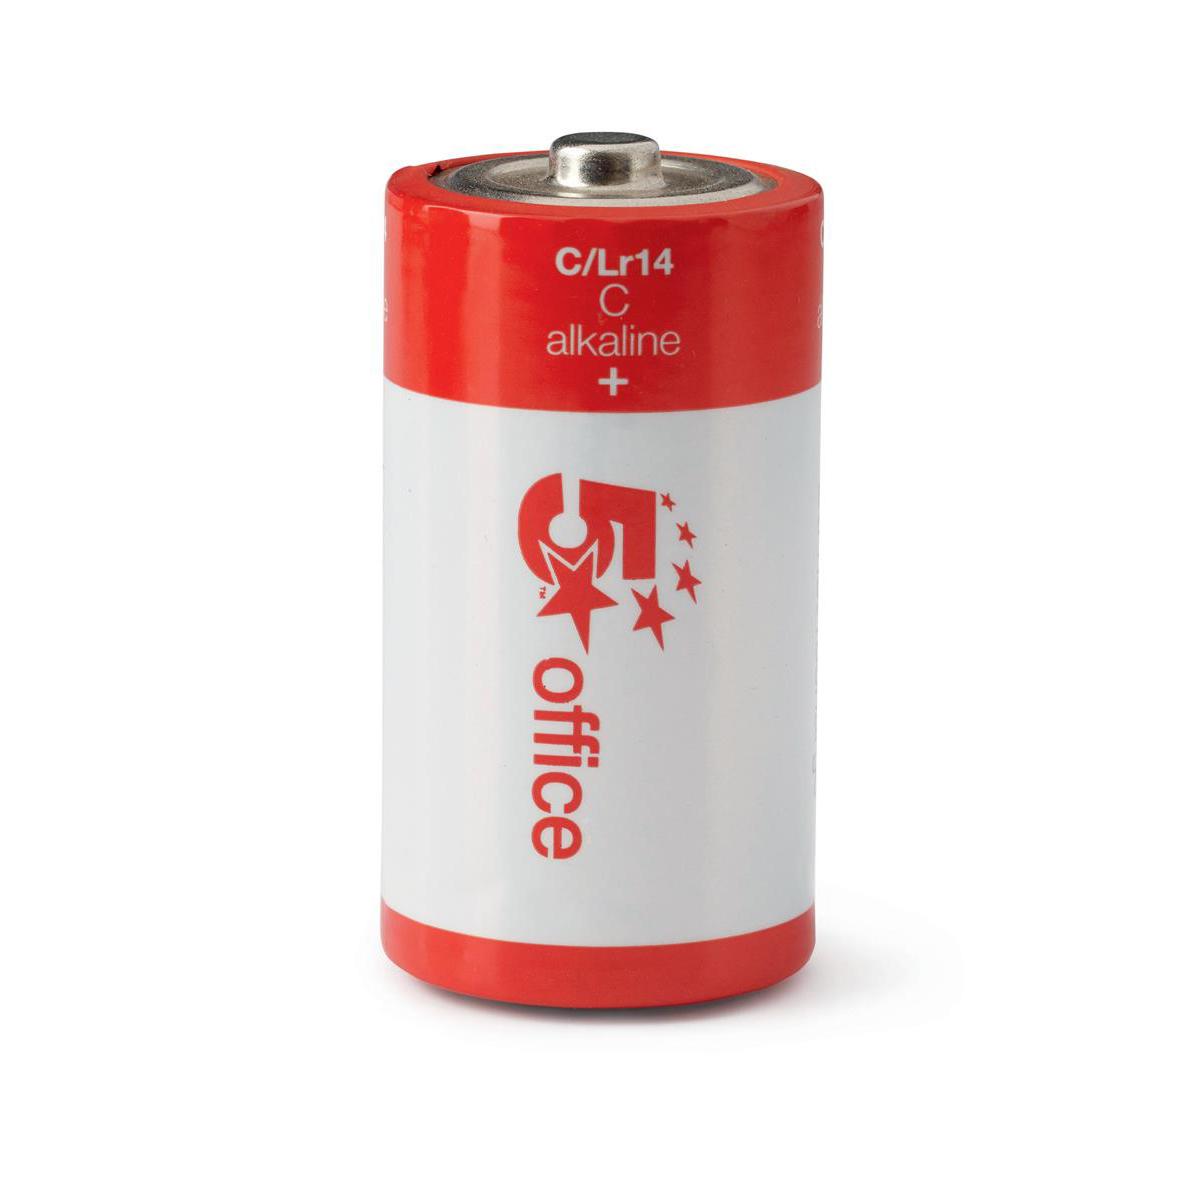 Image for 5 Star Office Batteries C/LR14 [Pack 12]